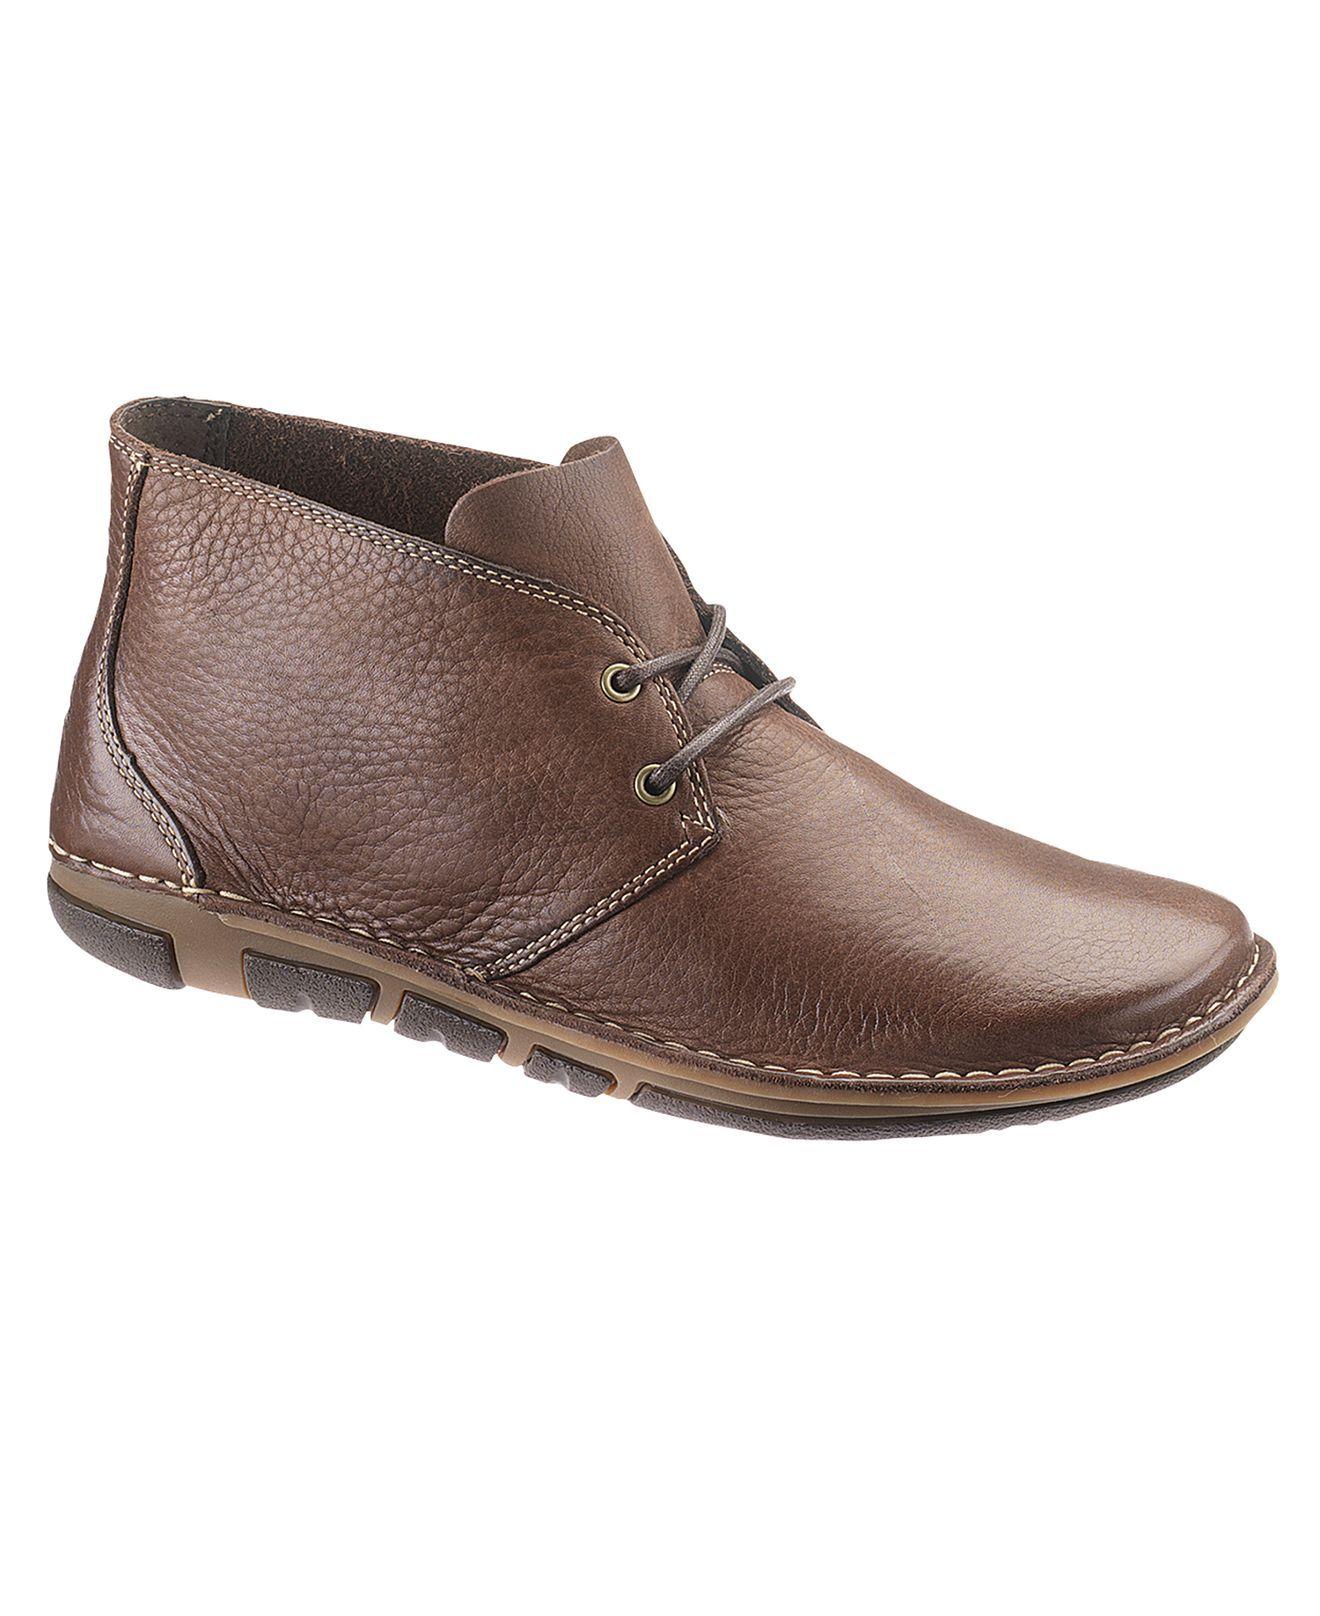 Hush Puppies Shoes, Hang Out Chukka Boots Web ID 600512